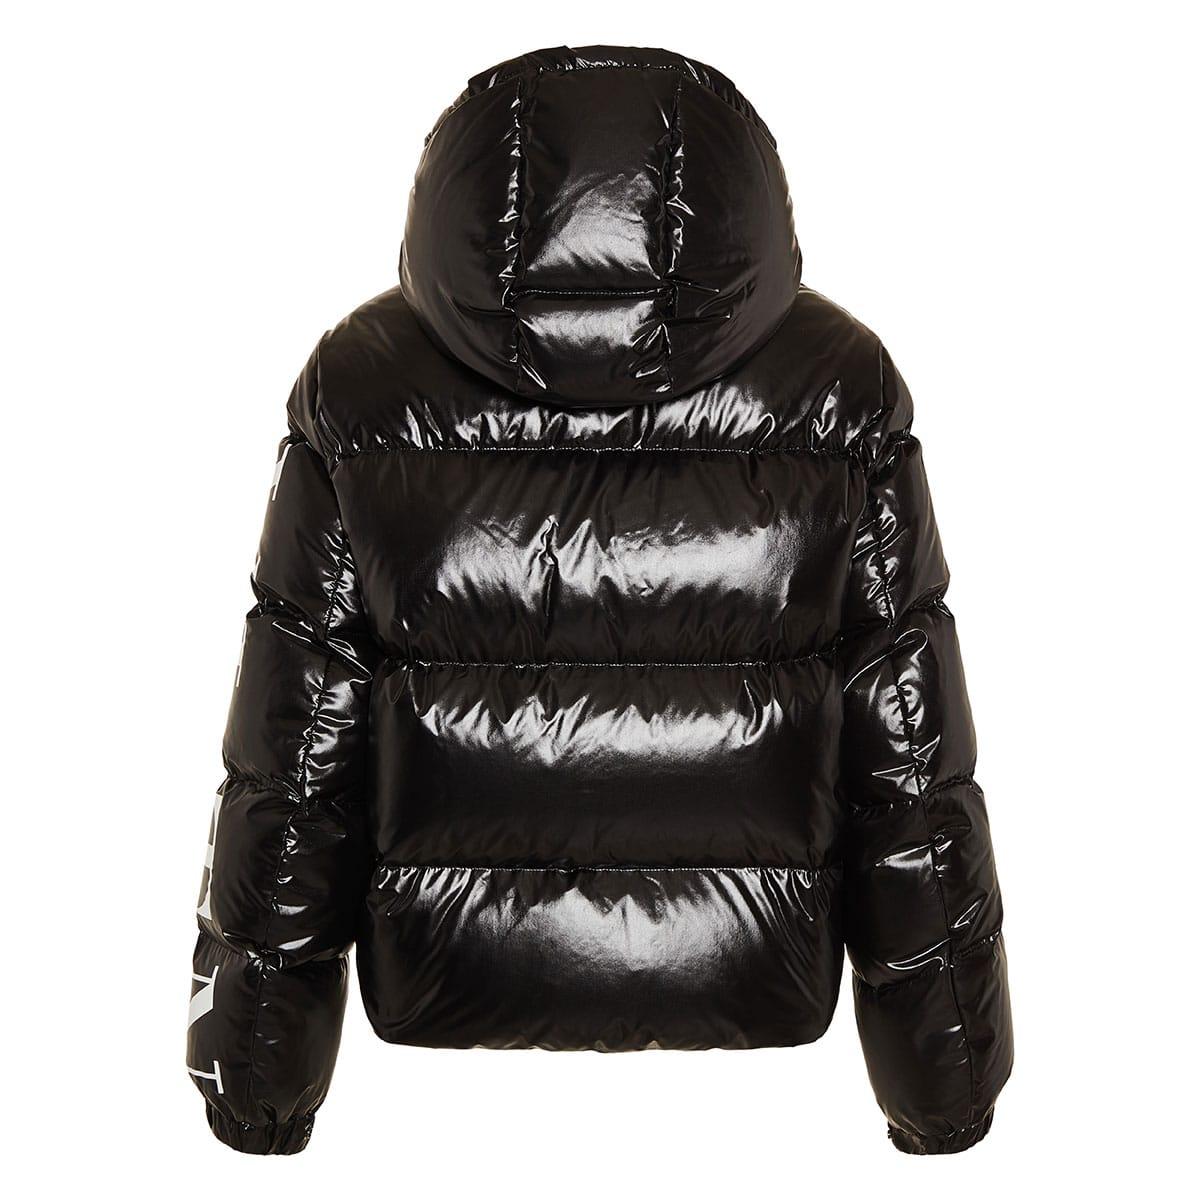 VLTN quilted puffer jacket